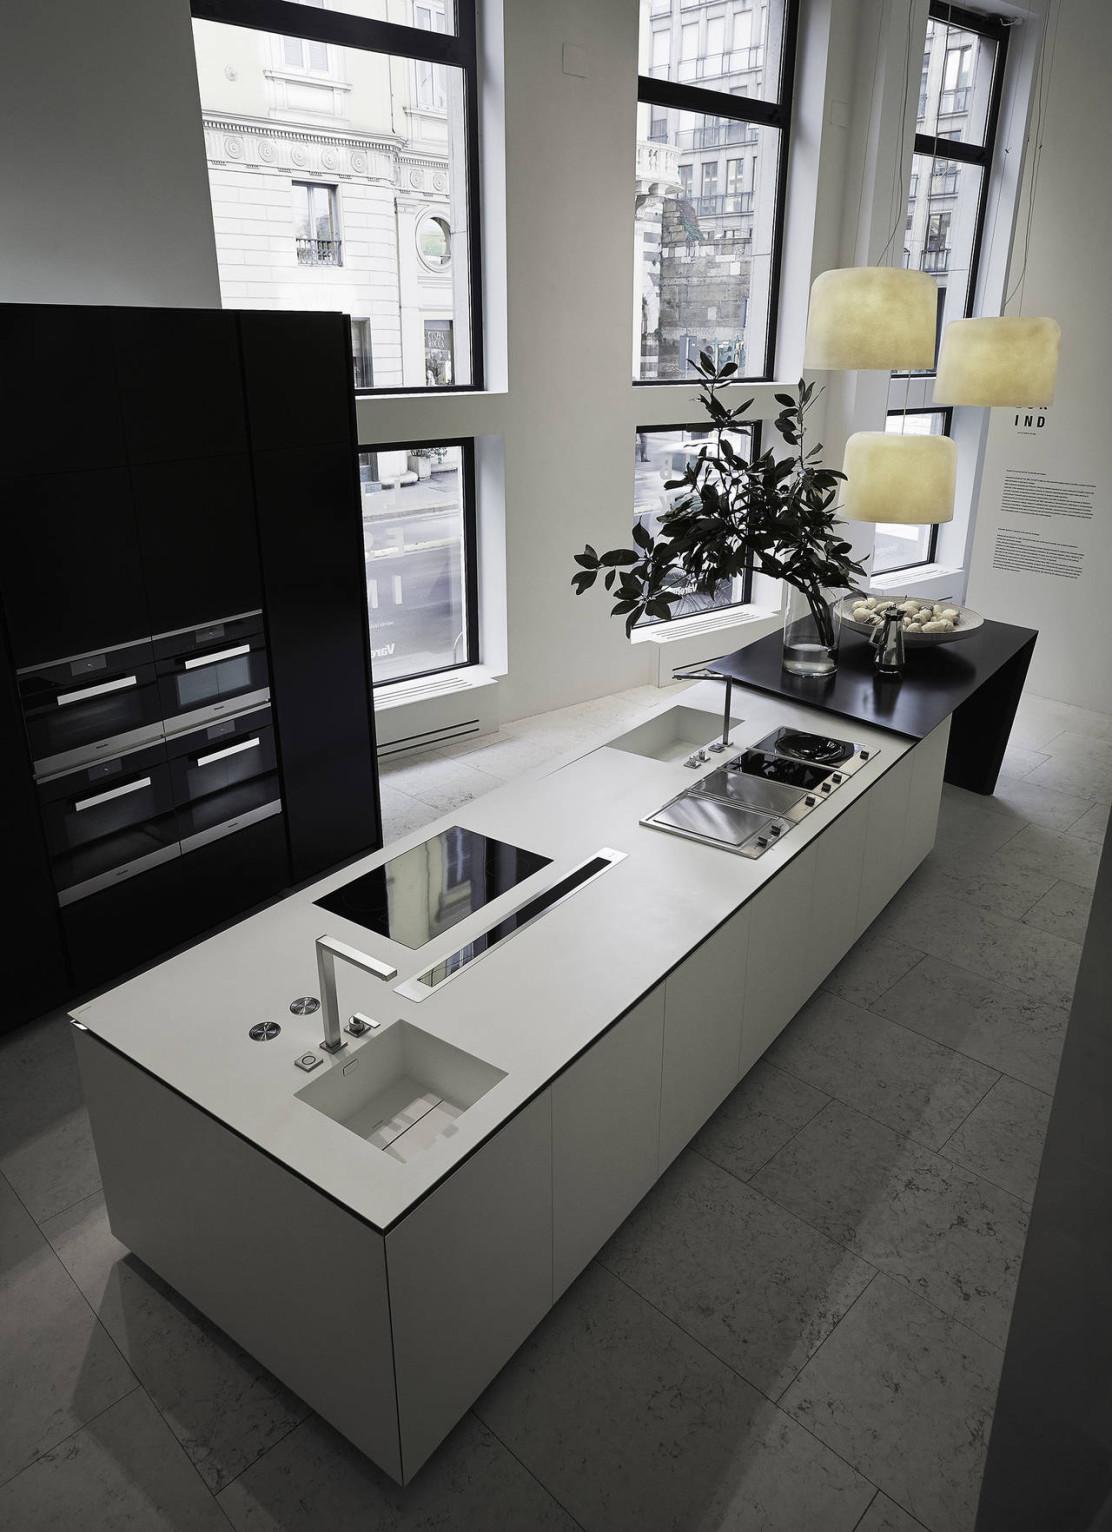 Dupont corian per le cucine varenna ambiente cucina - Schienali per cucine ...